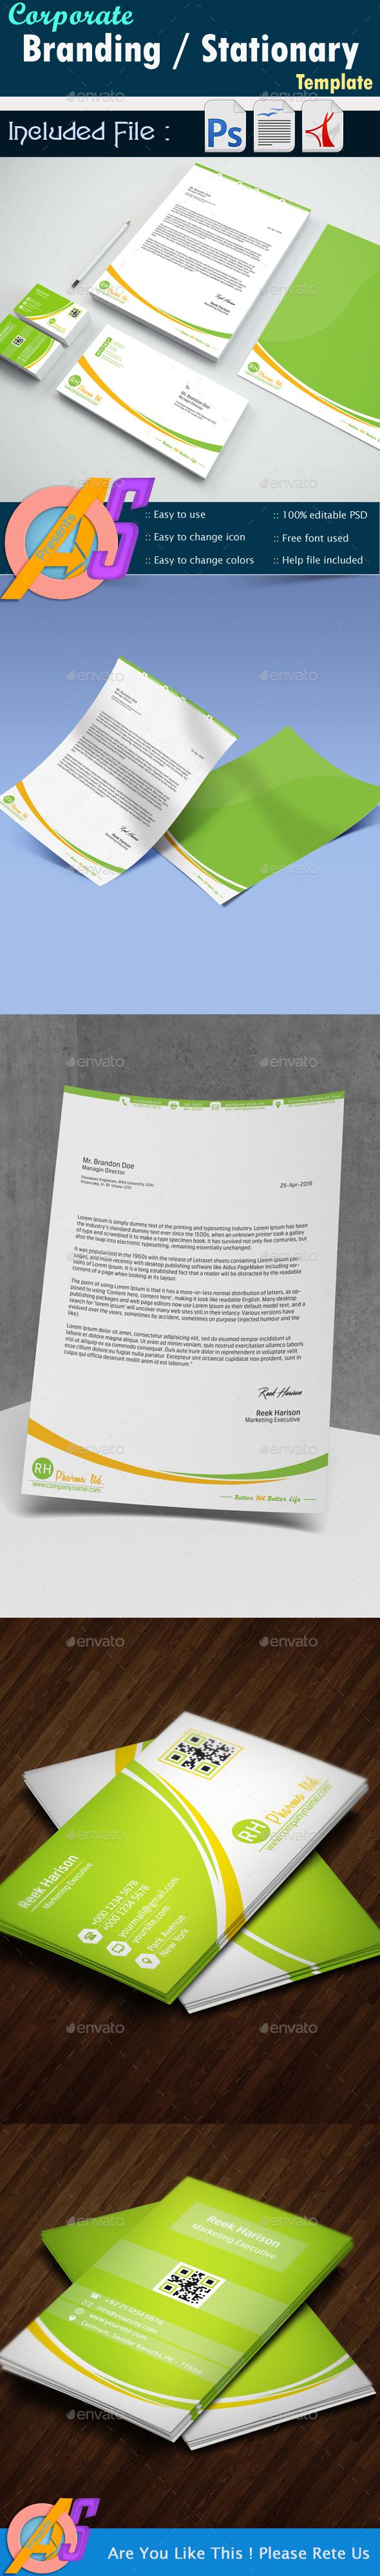 Corporate Branding Identity Templates - Corporate Business Cards